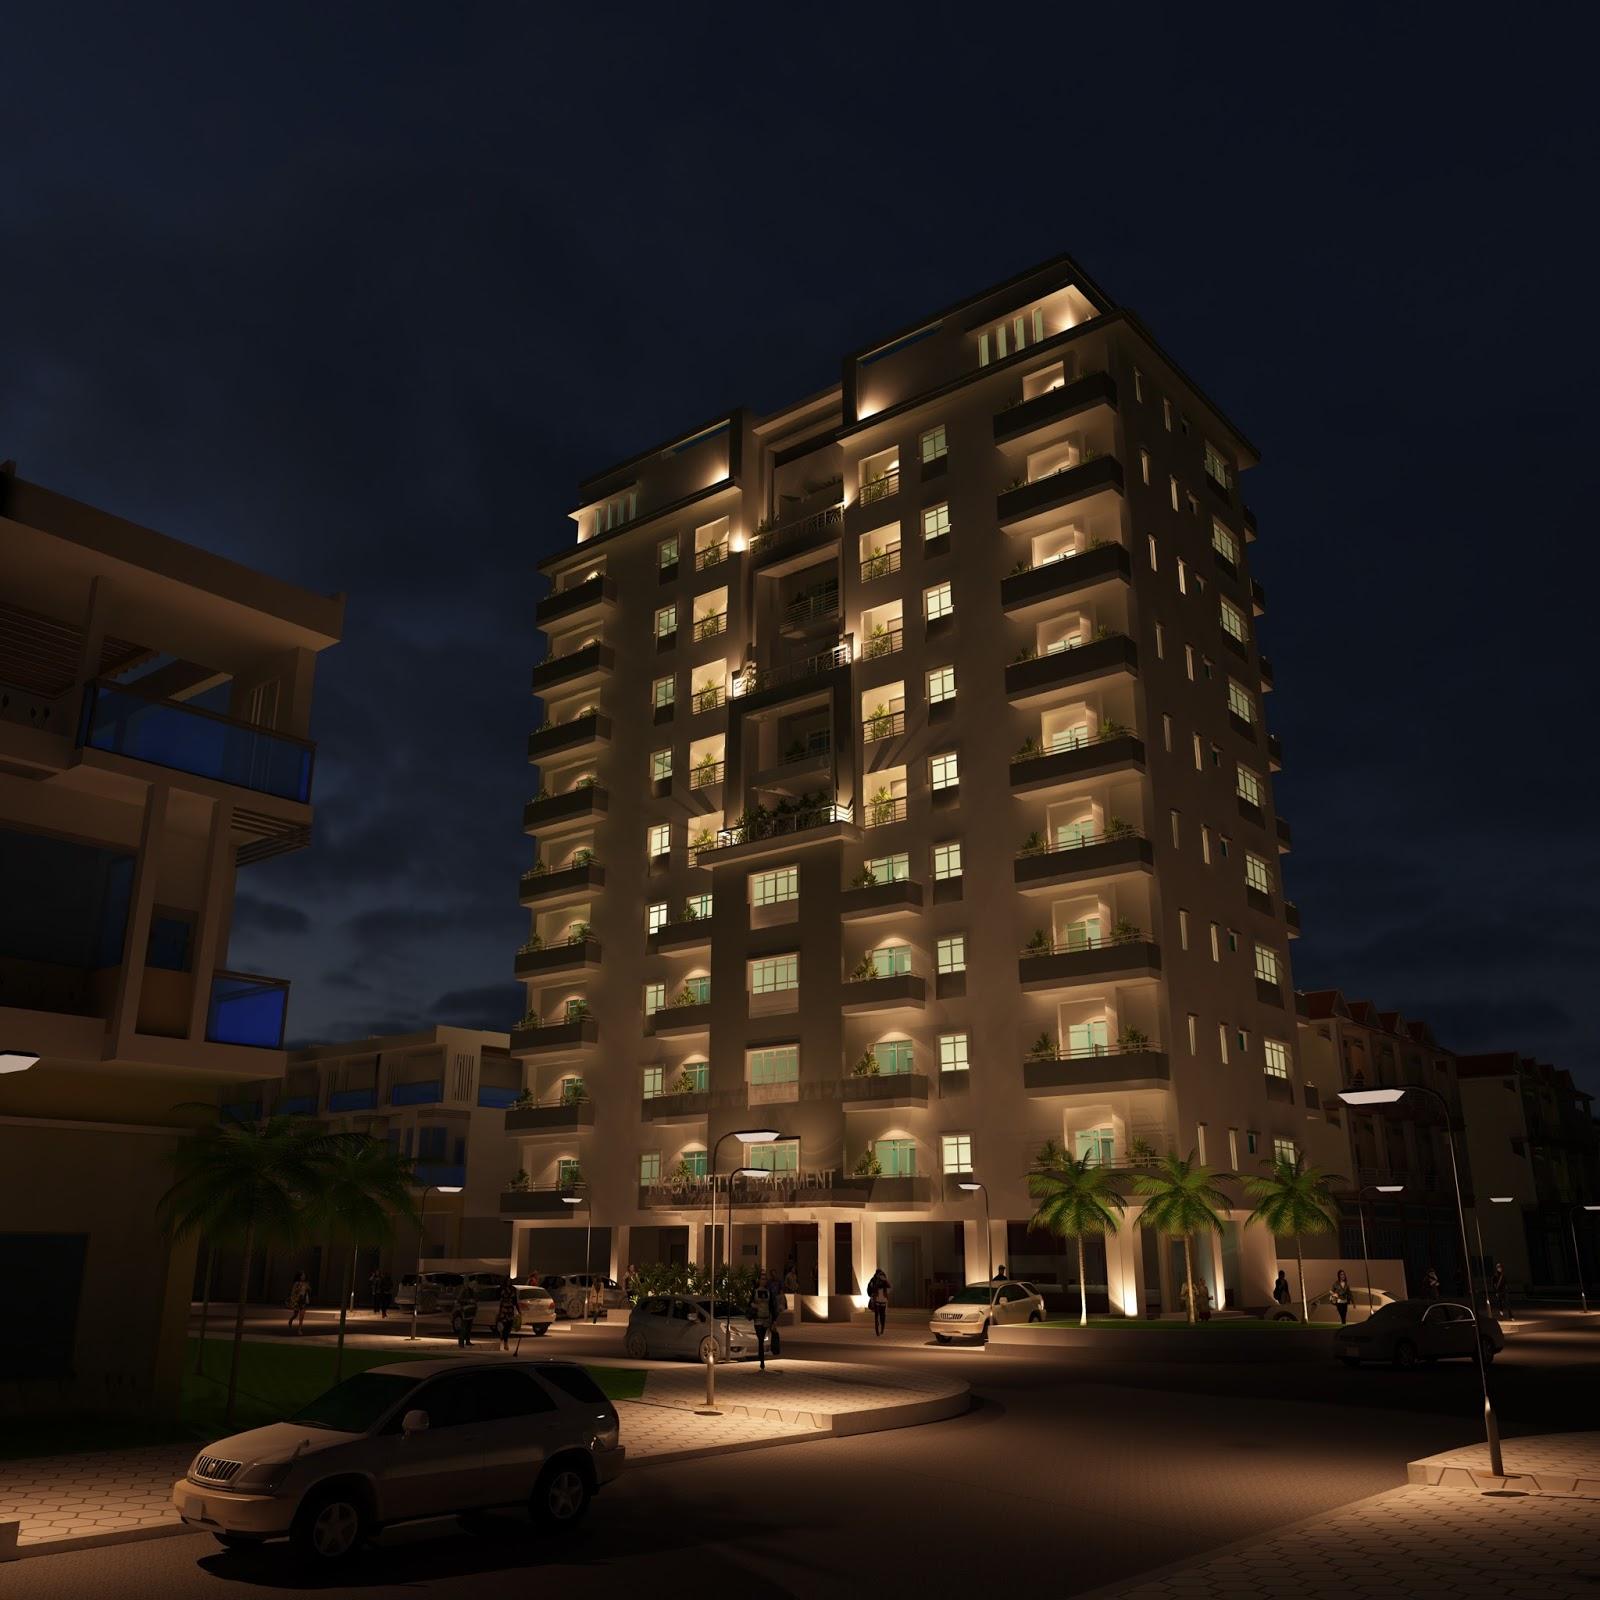 Apartment Exterior: Architect Apartment Exterior Design Sketchup Model Ref 003